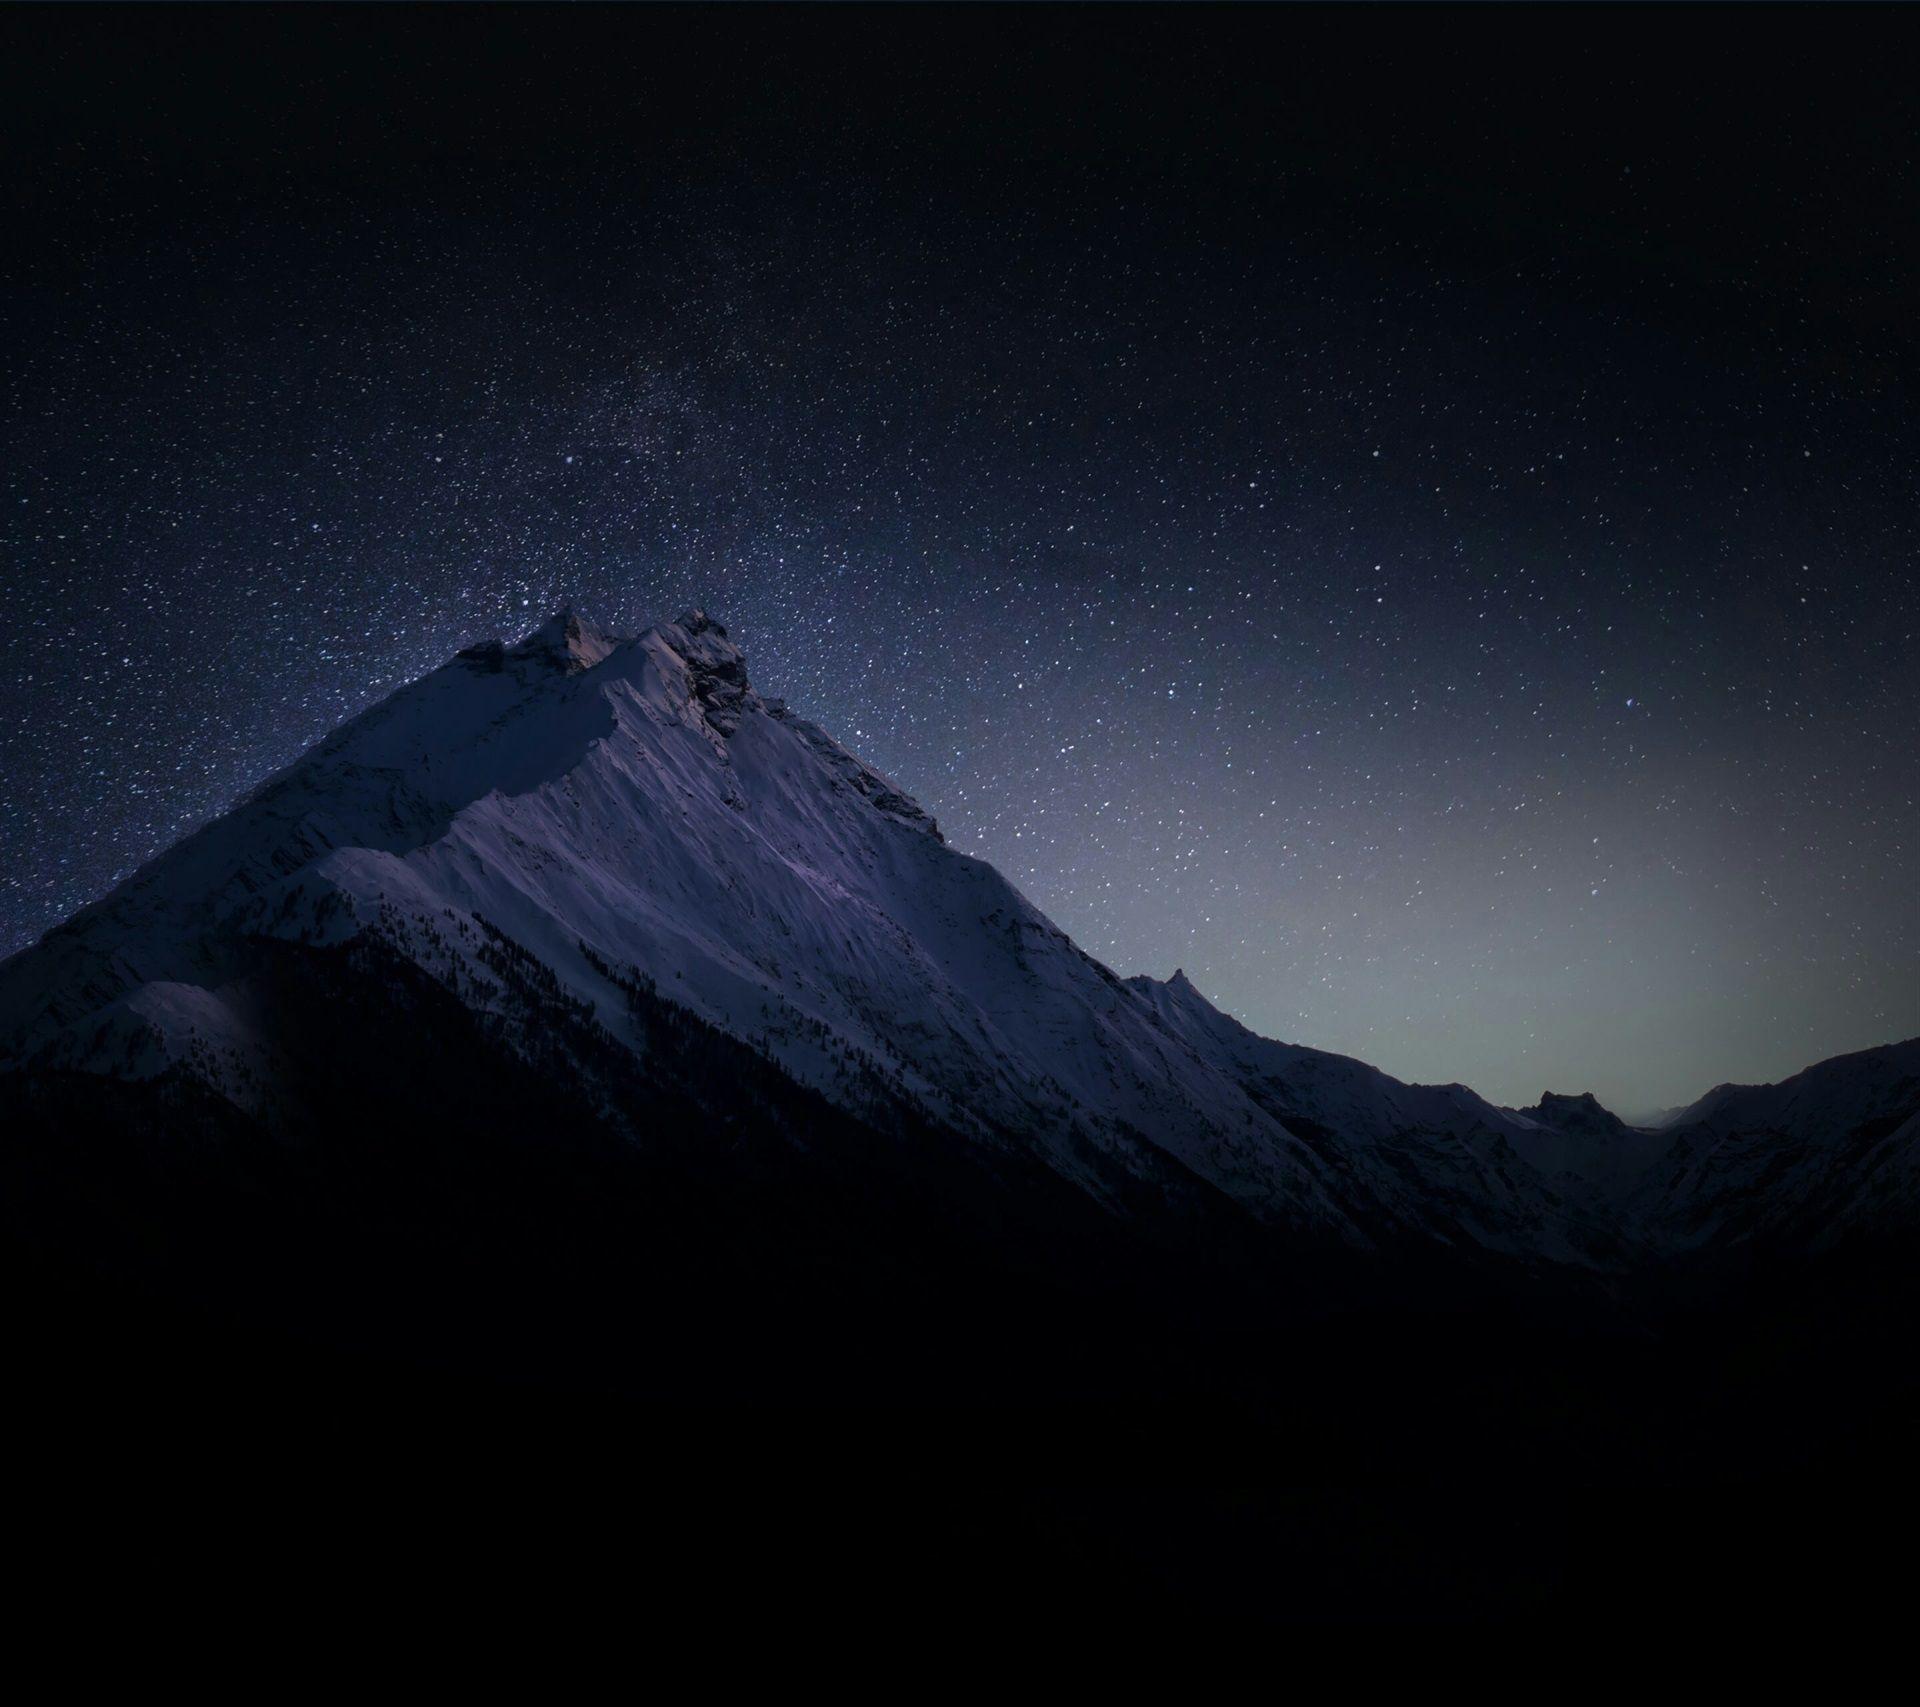 1920x1707 Dark Mountains Free Wallpaper For Pc Dark Mountains Dark Landscape Dark Wallpaper